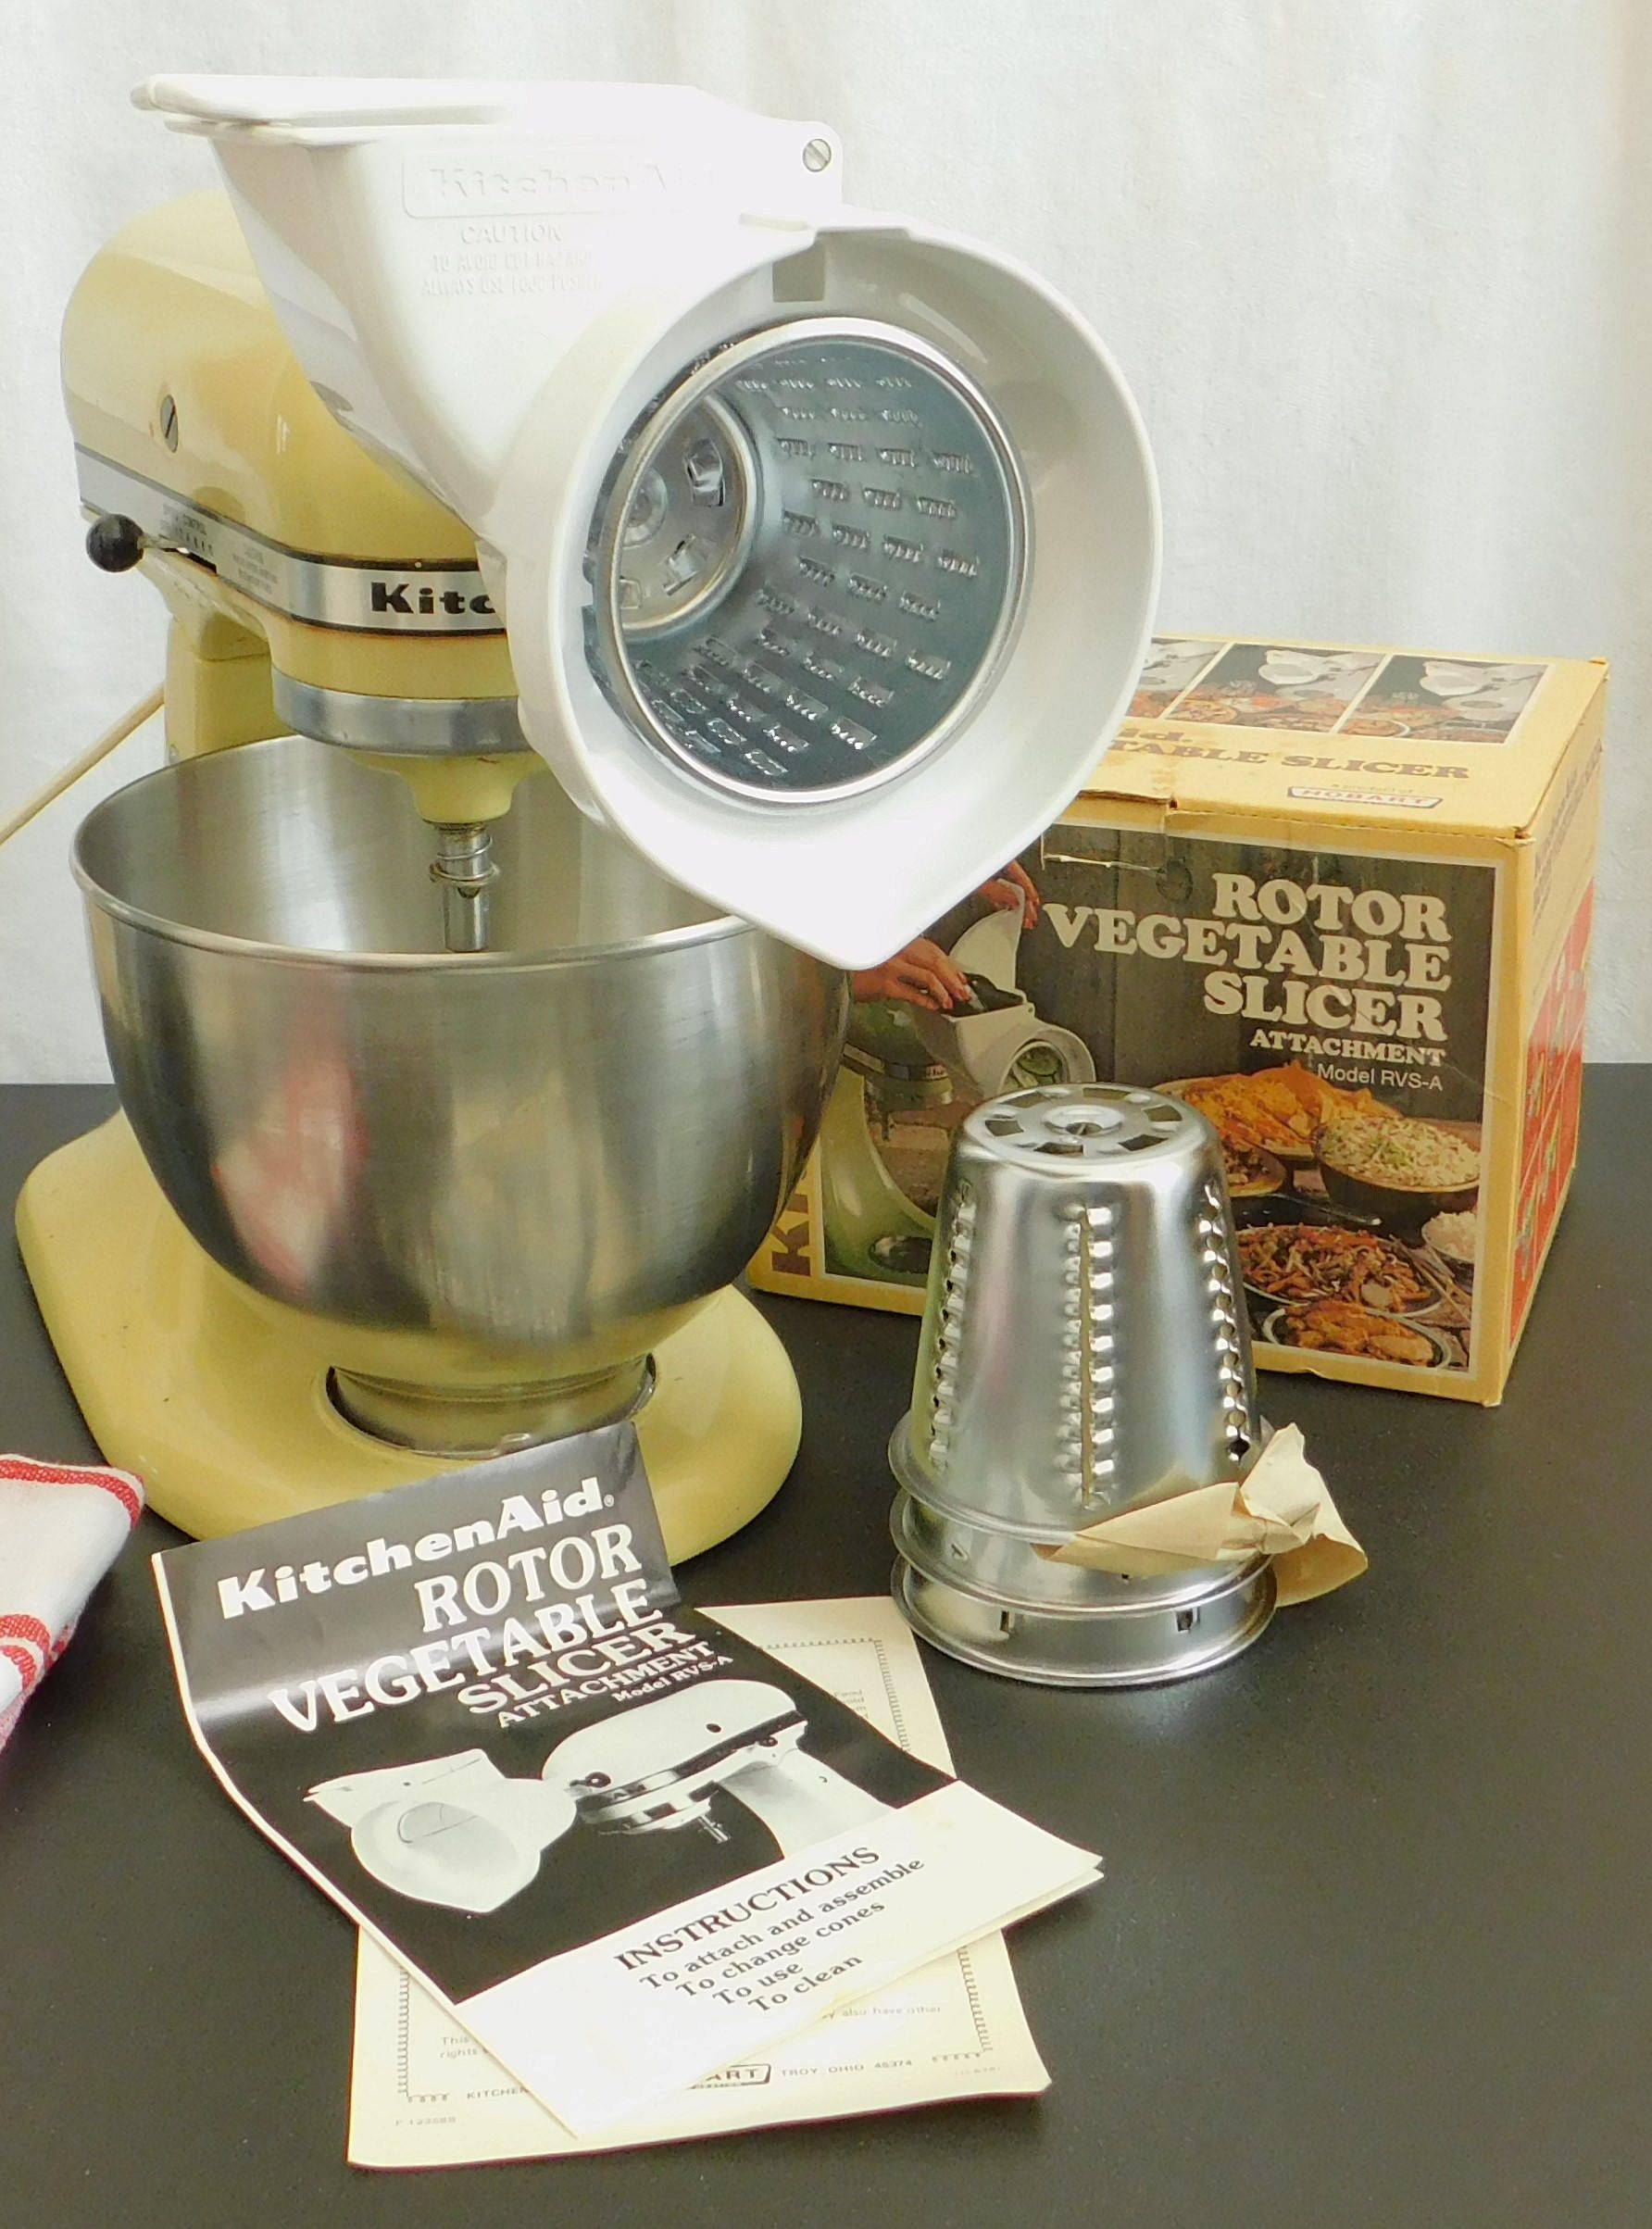 Vintage Kitchenaid Rotor Food Vegetable Slicer Attachment Cutter